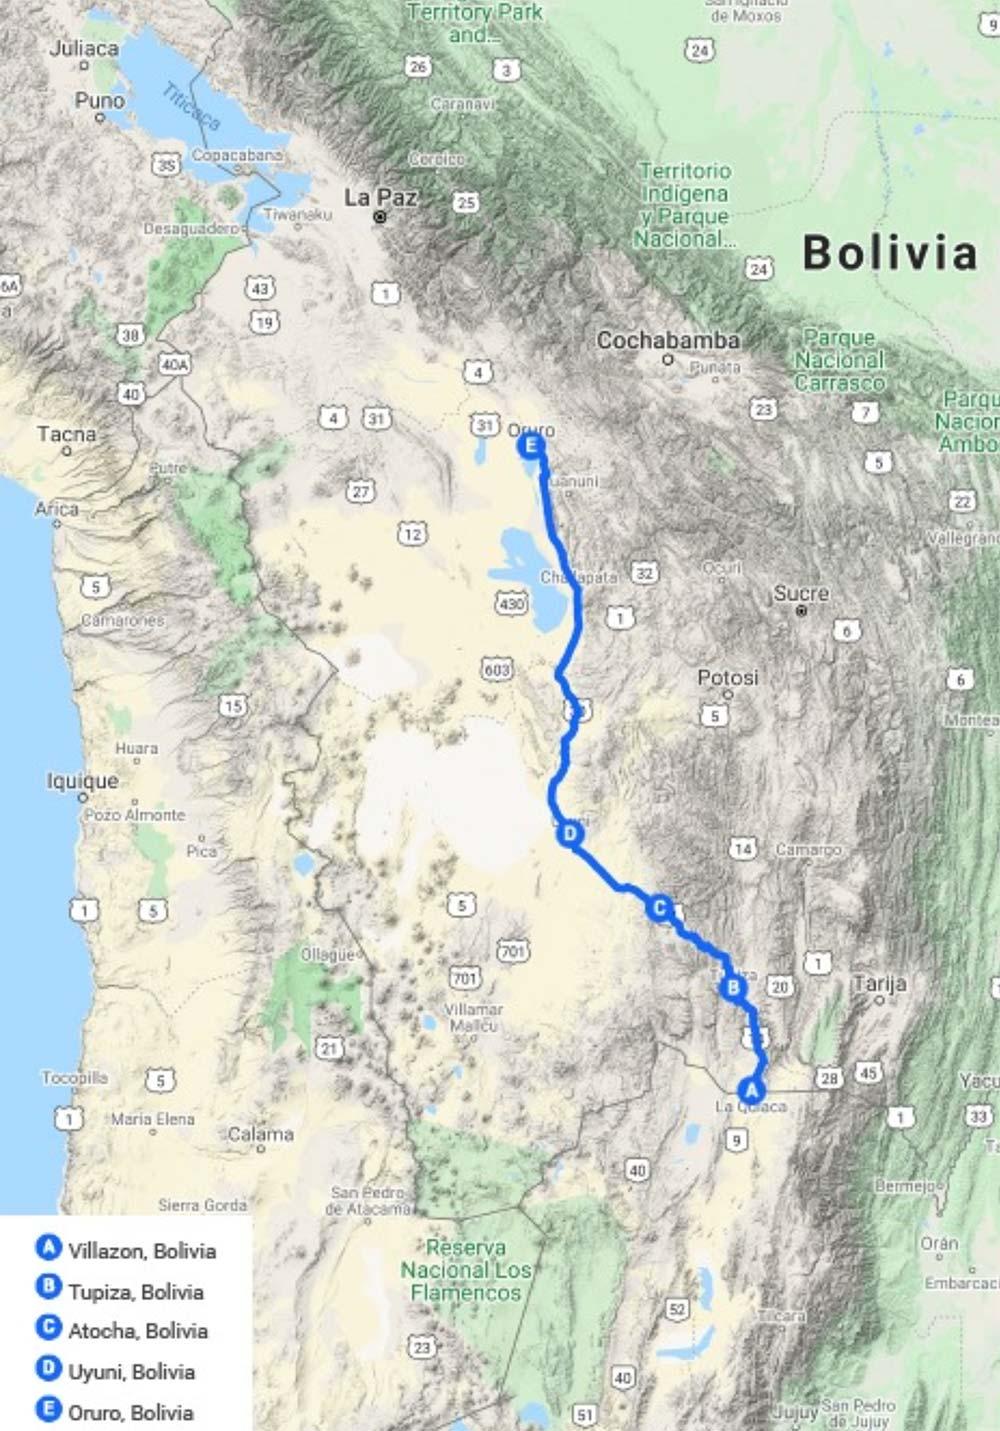 Railway Map Expreso del Sur and Wara Wara Express